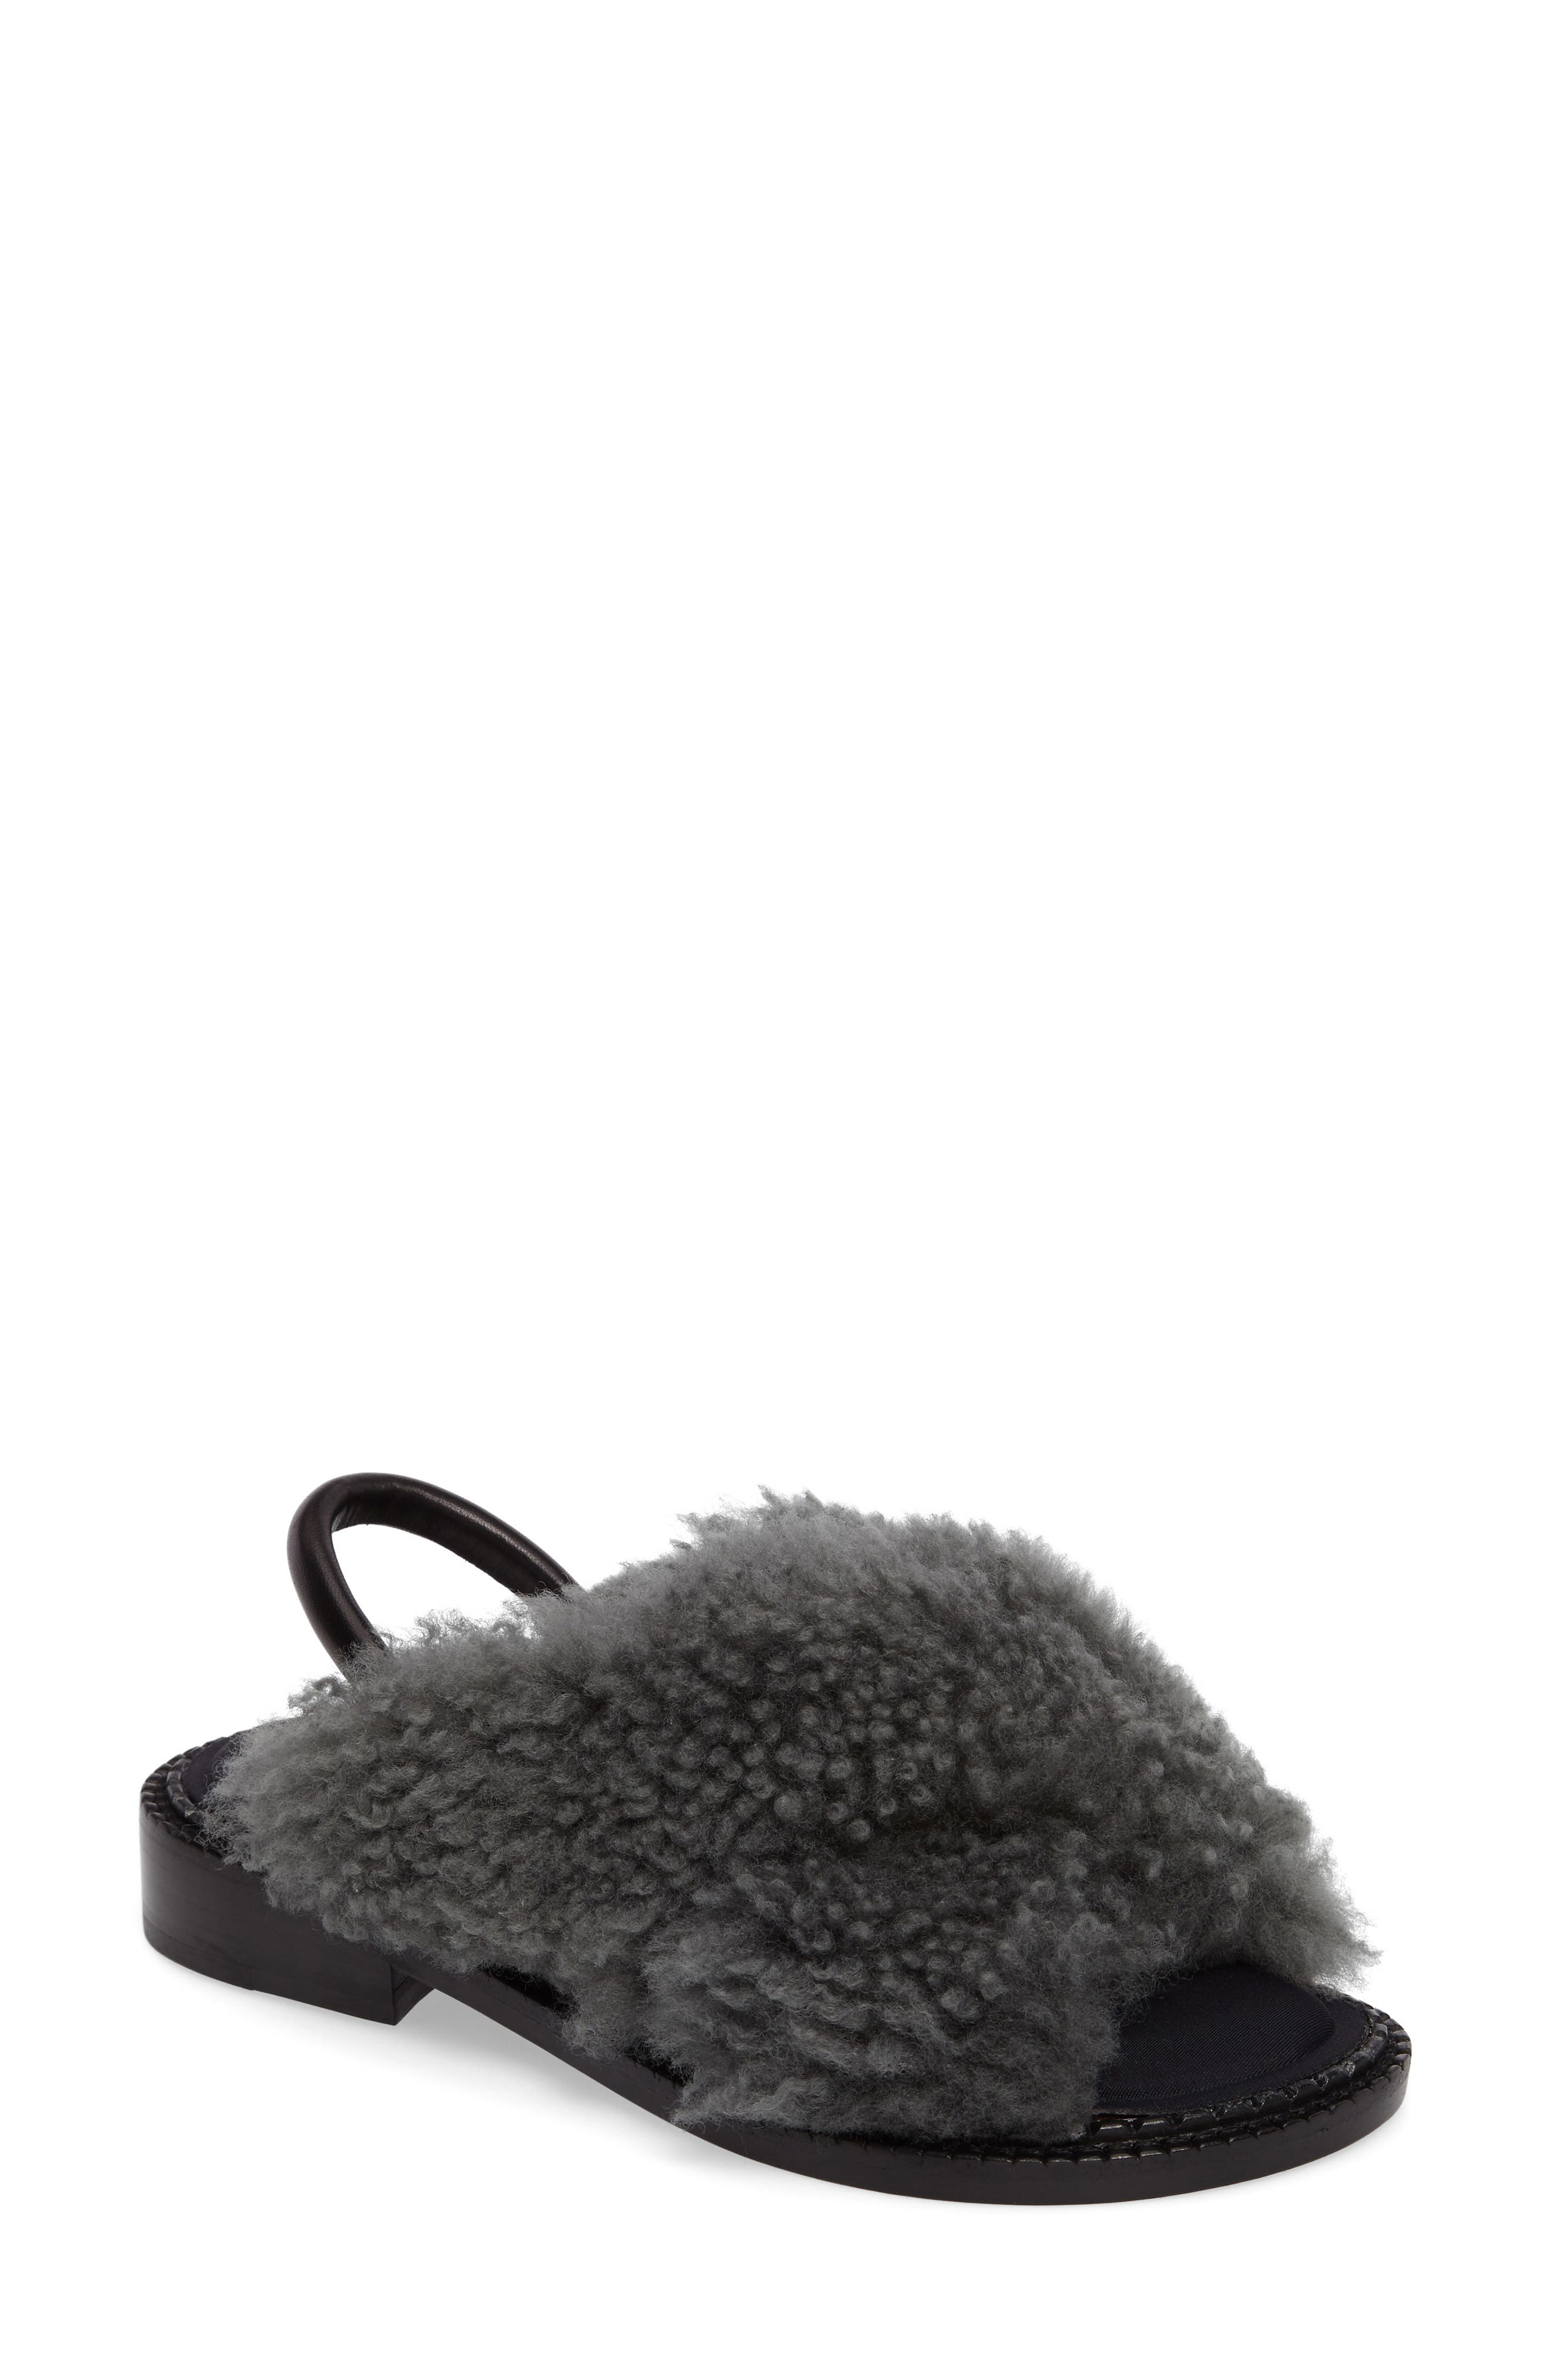 Alternate Image 1 Selected - Robert Clergerie Bloss Genuine Fur Sandal (Women)